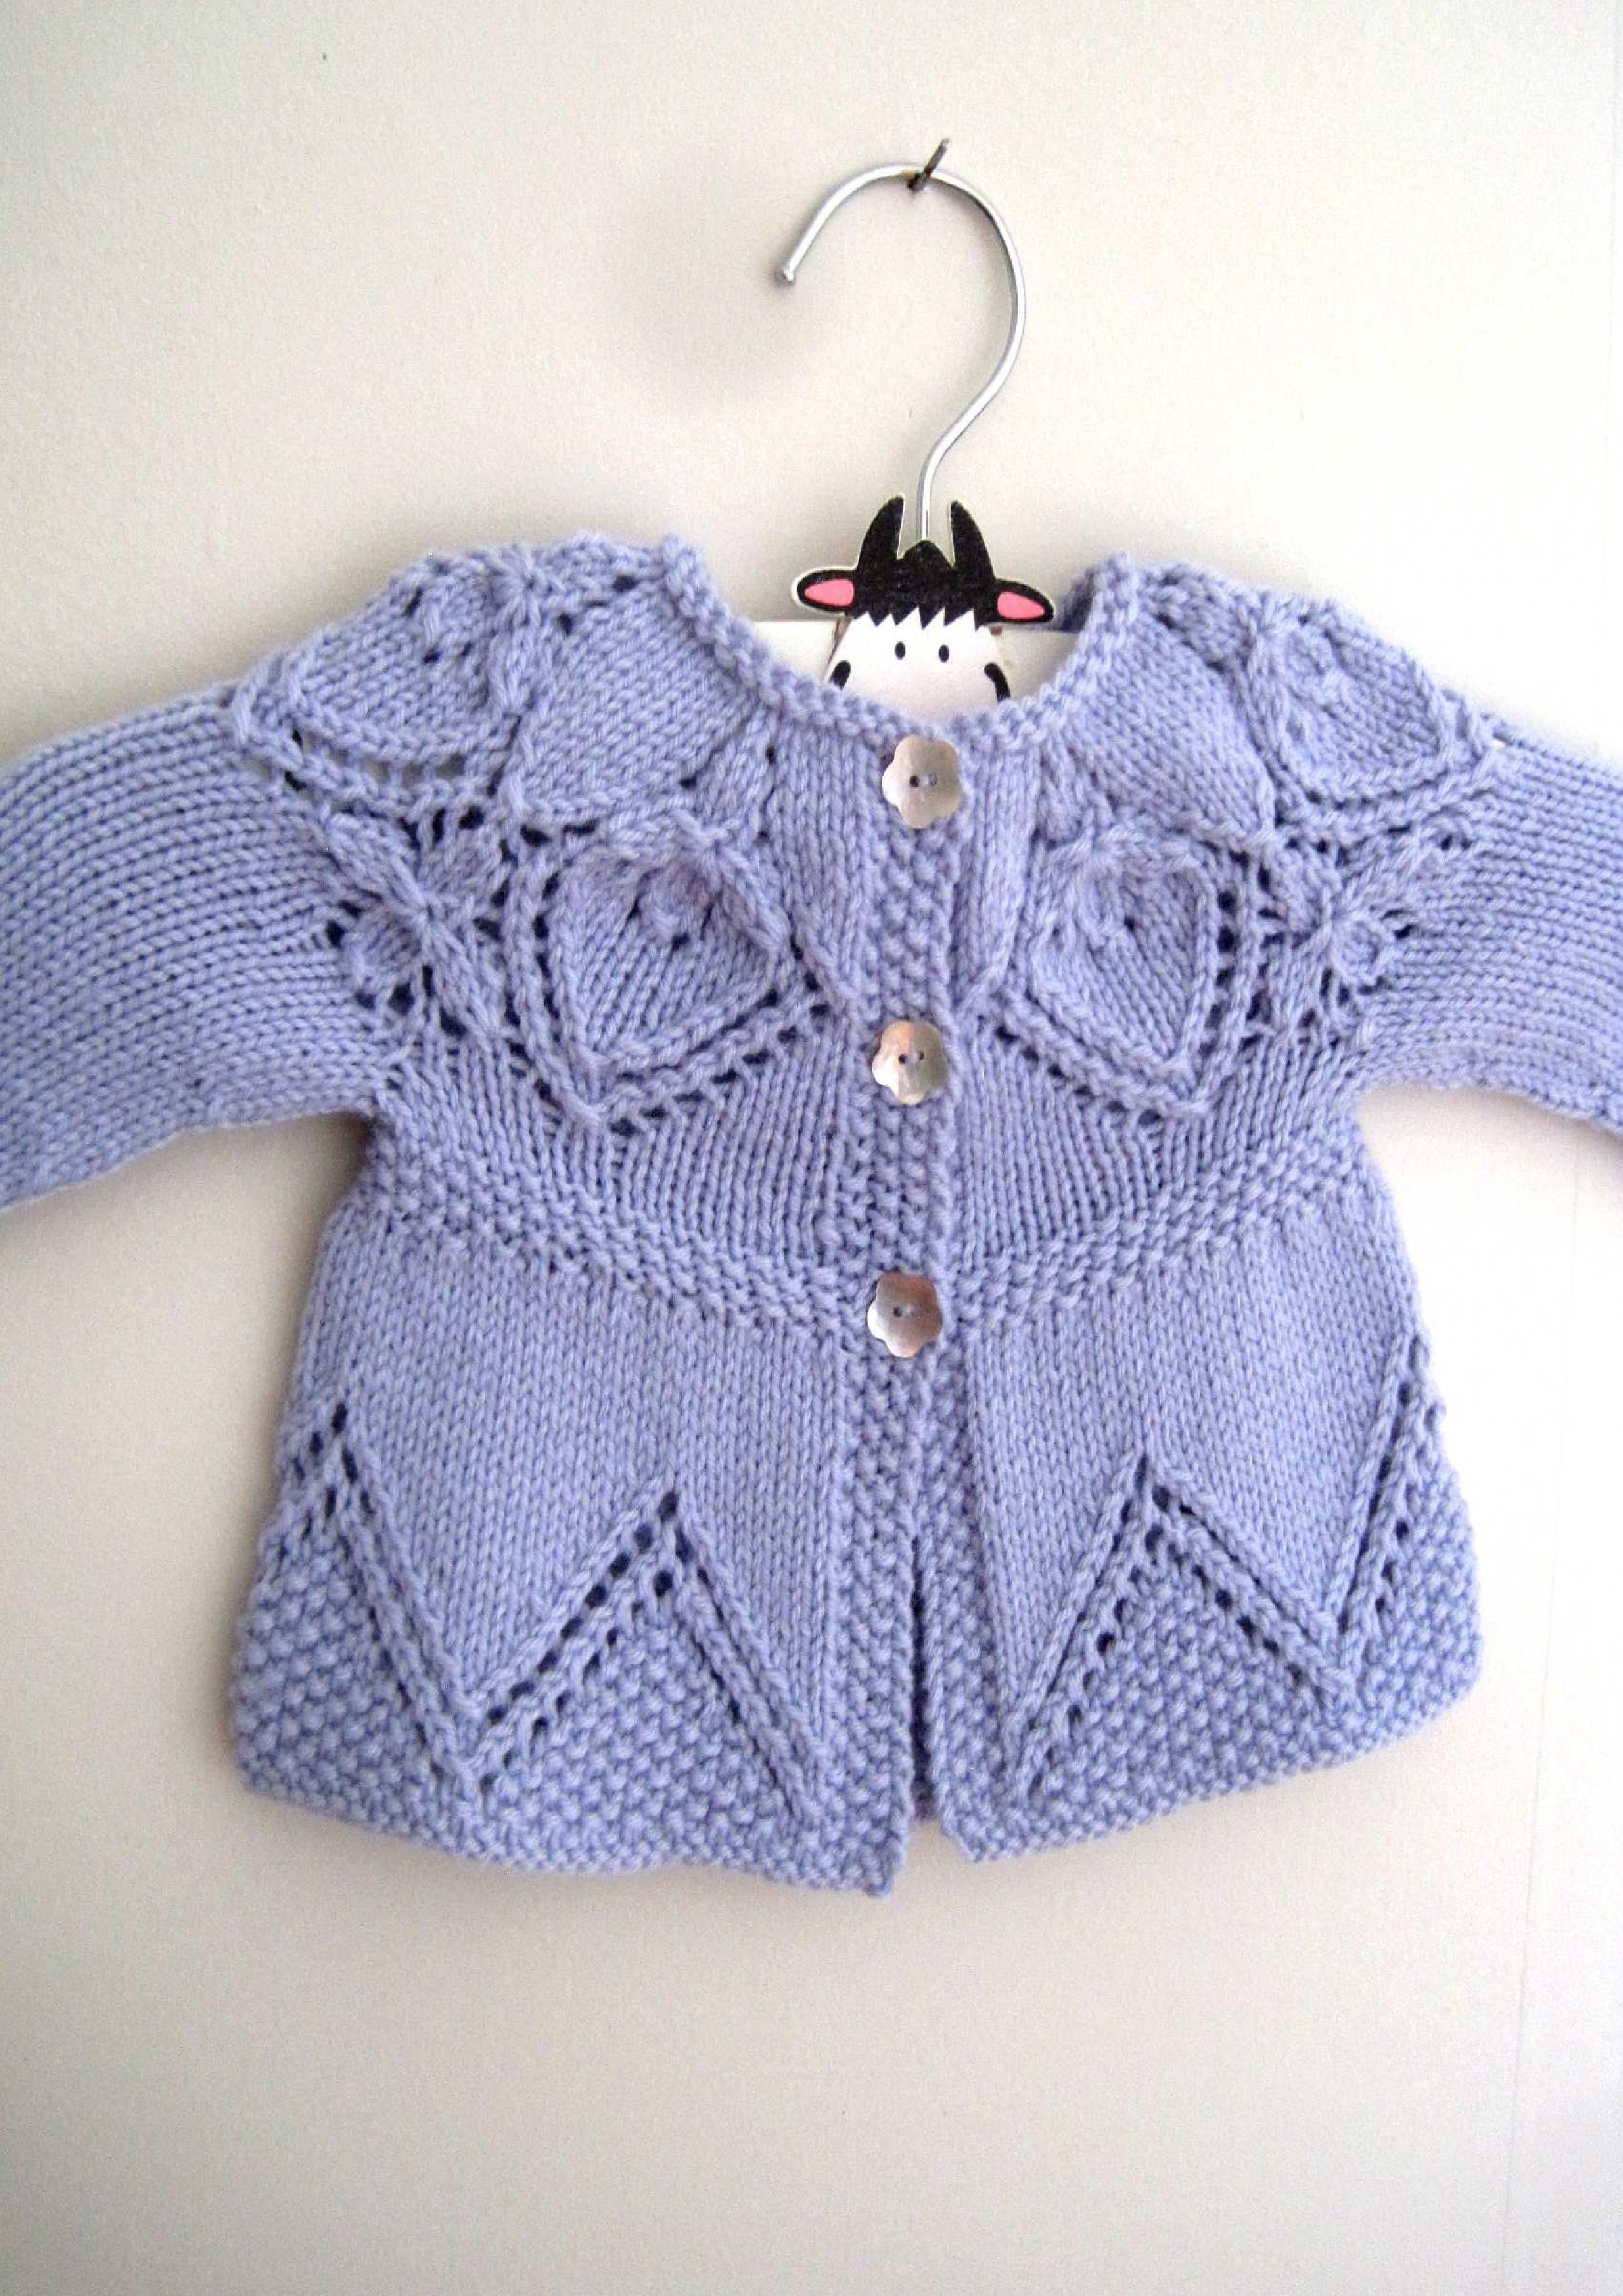 Cora Cardi Knitting Pattern by Suzie Sparkles. Baby cardigan ...